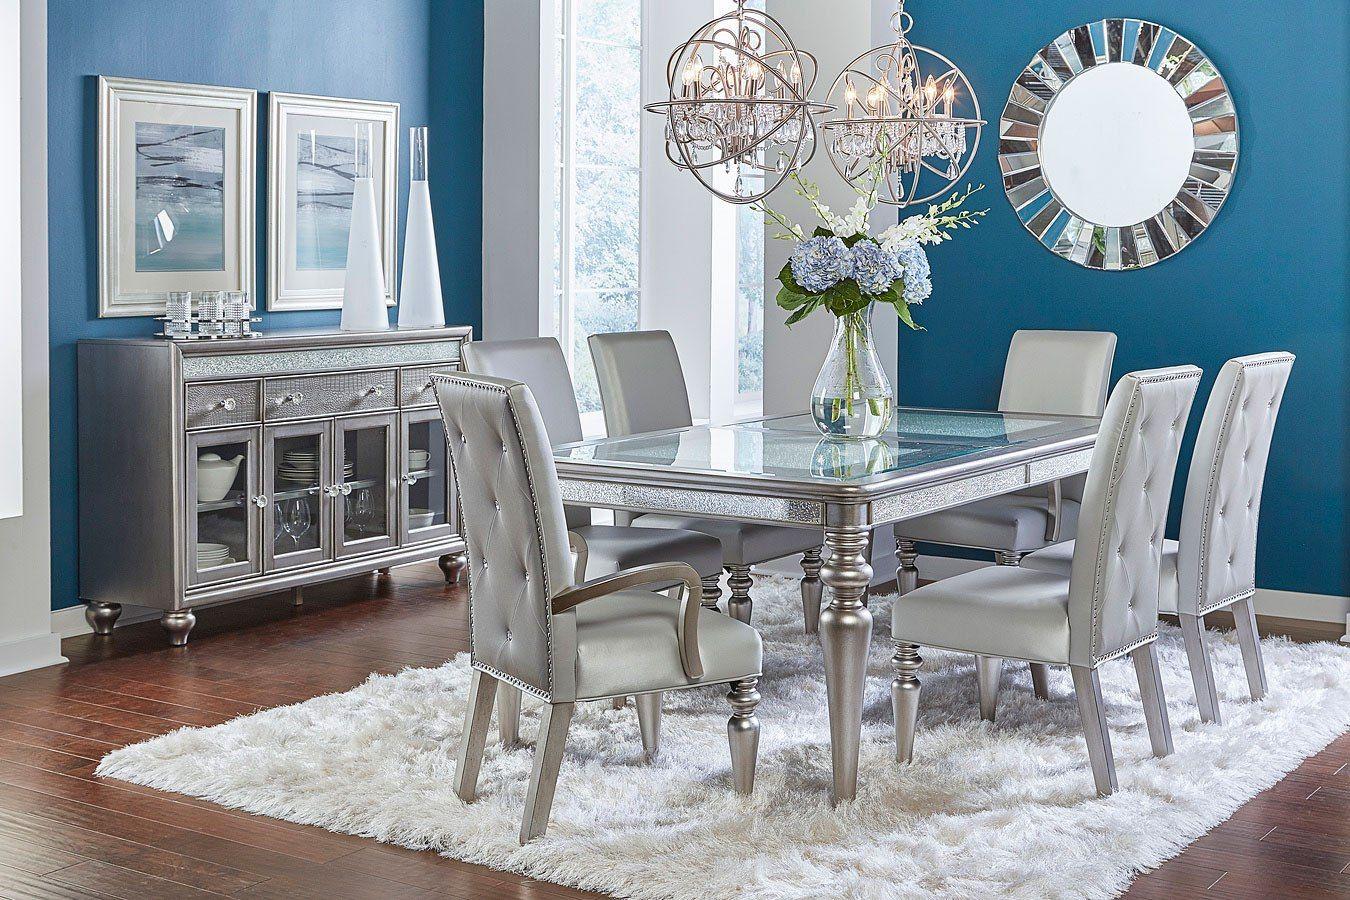 Posh Dining Room Set Luxury Dining Room Dining Room Interiors Dining Room Design